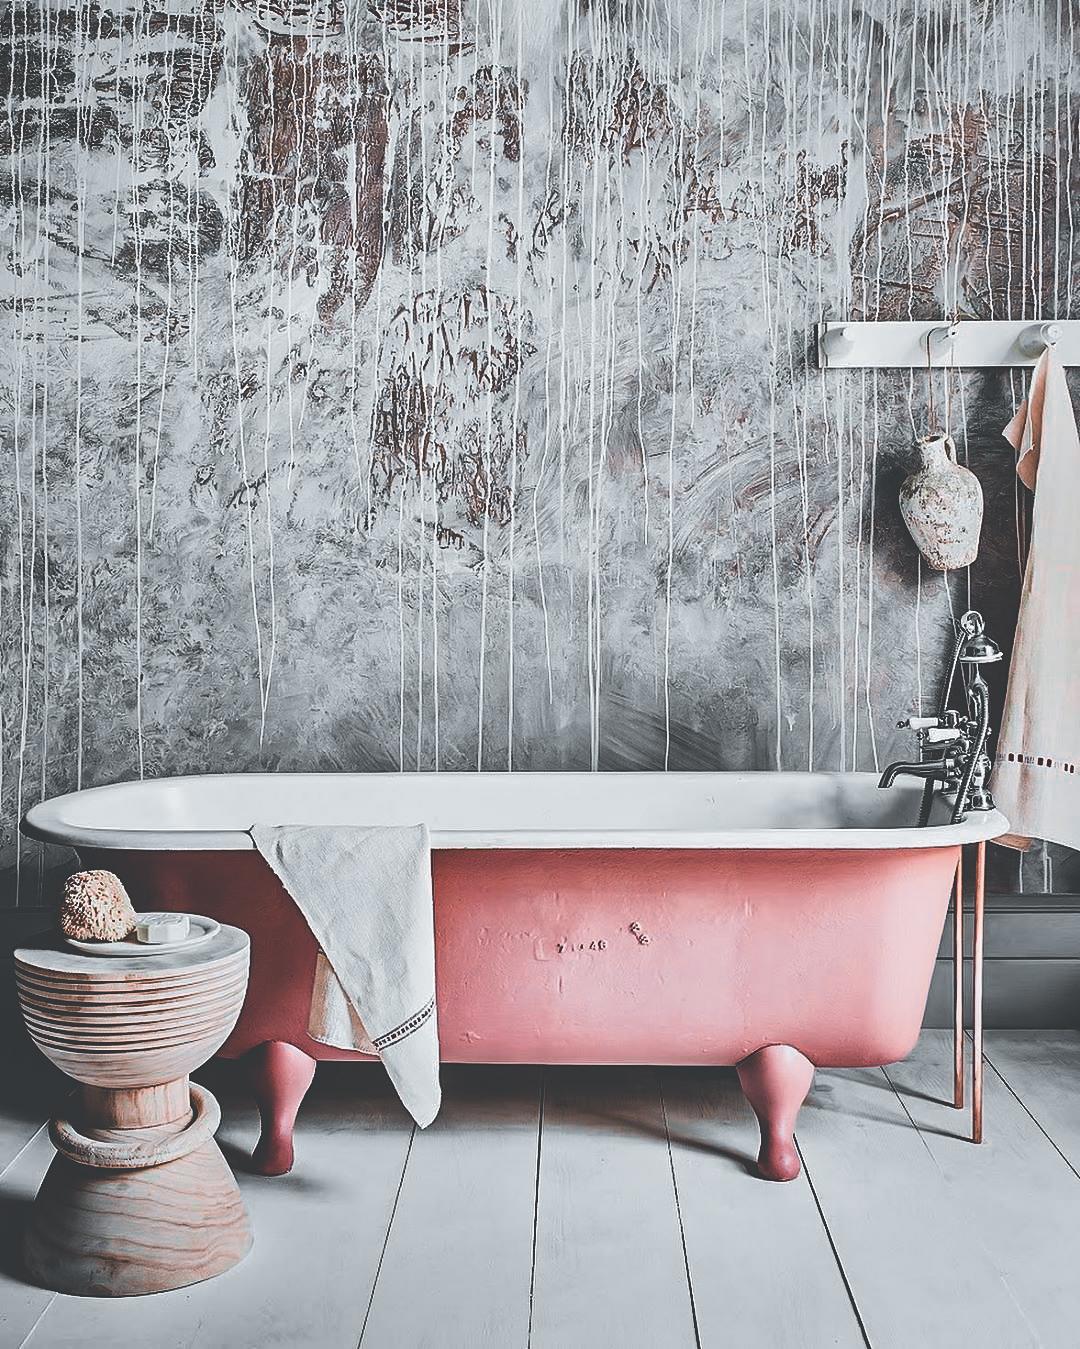 24-the-prettiest-pink-bathroom-design-ideas-2020